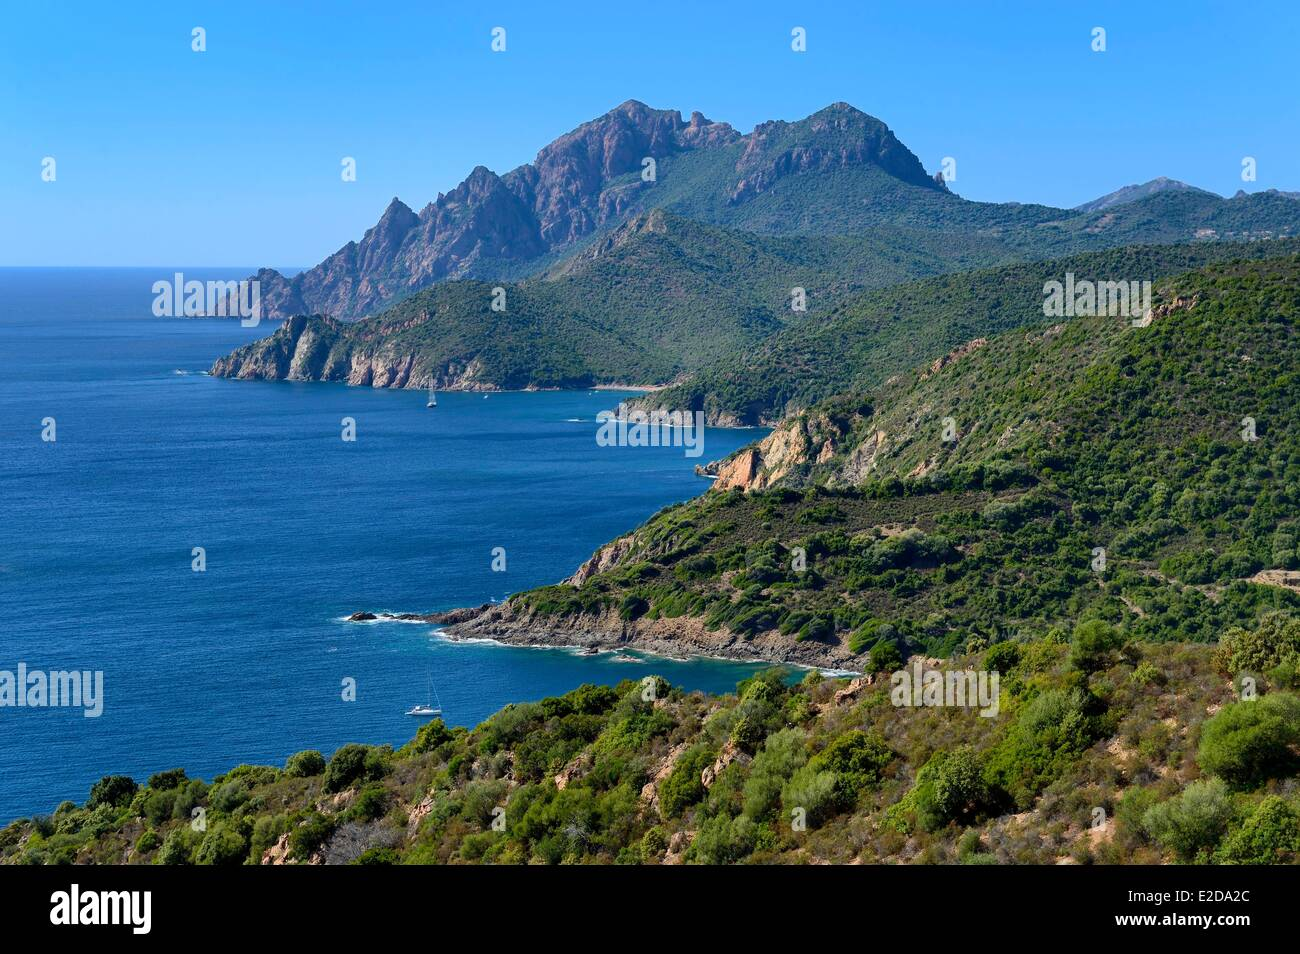 Frankreich, Corse du Sud, Golfe de Porto, Weltkulturerbe der UNESCO, der Capo Senino Stockbild